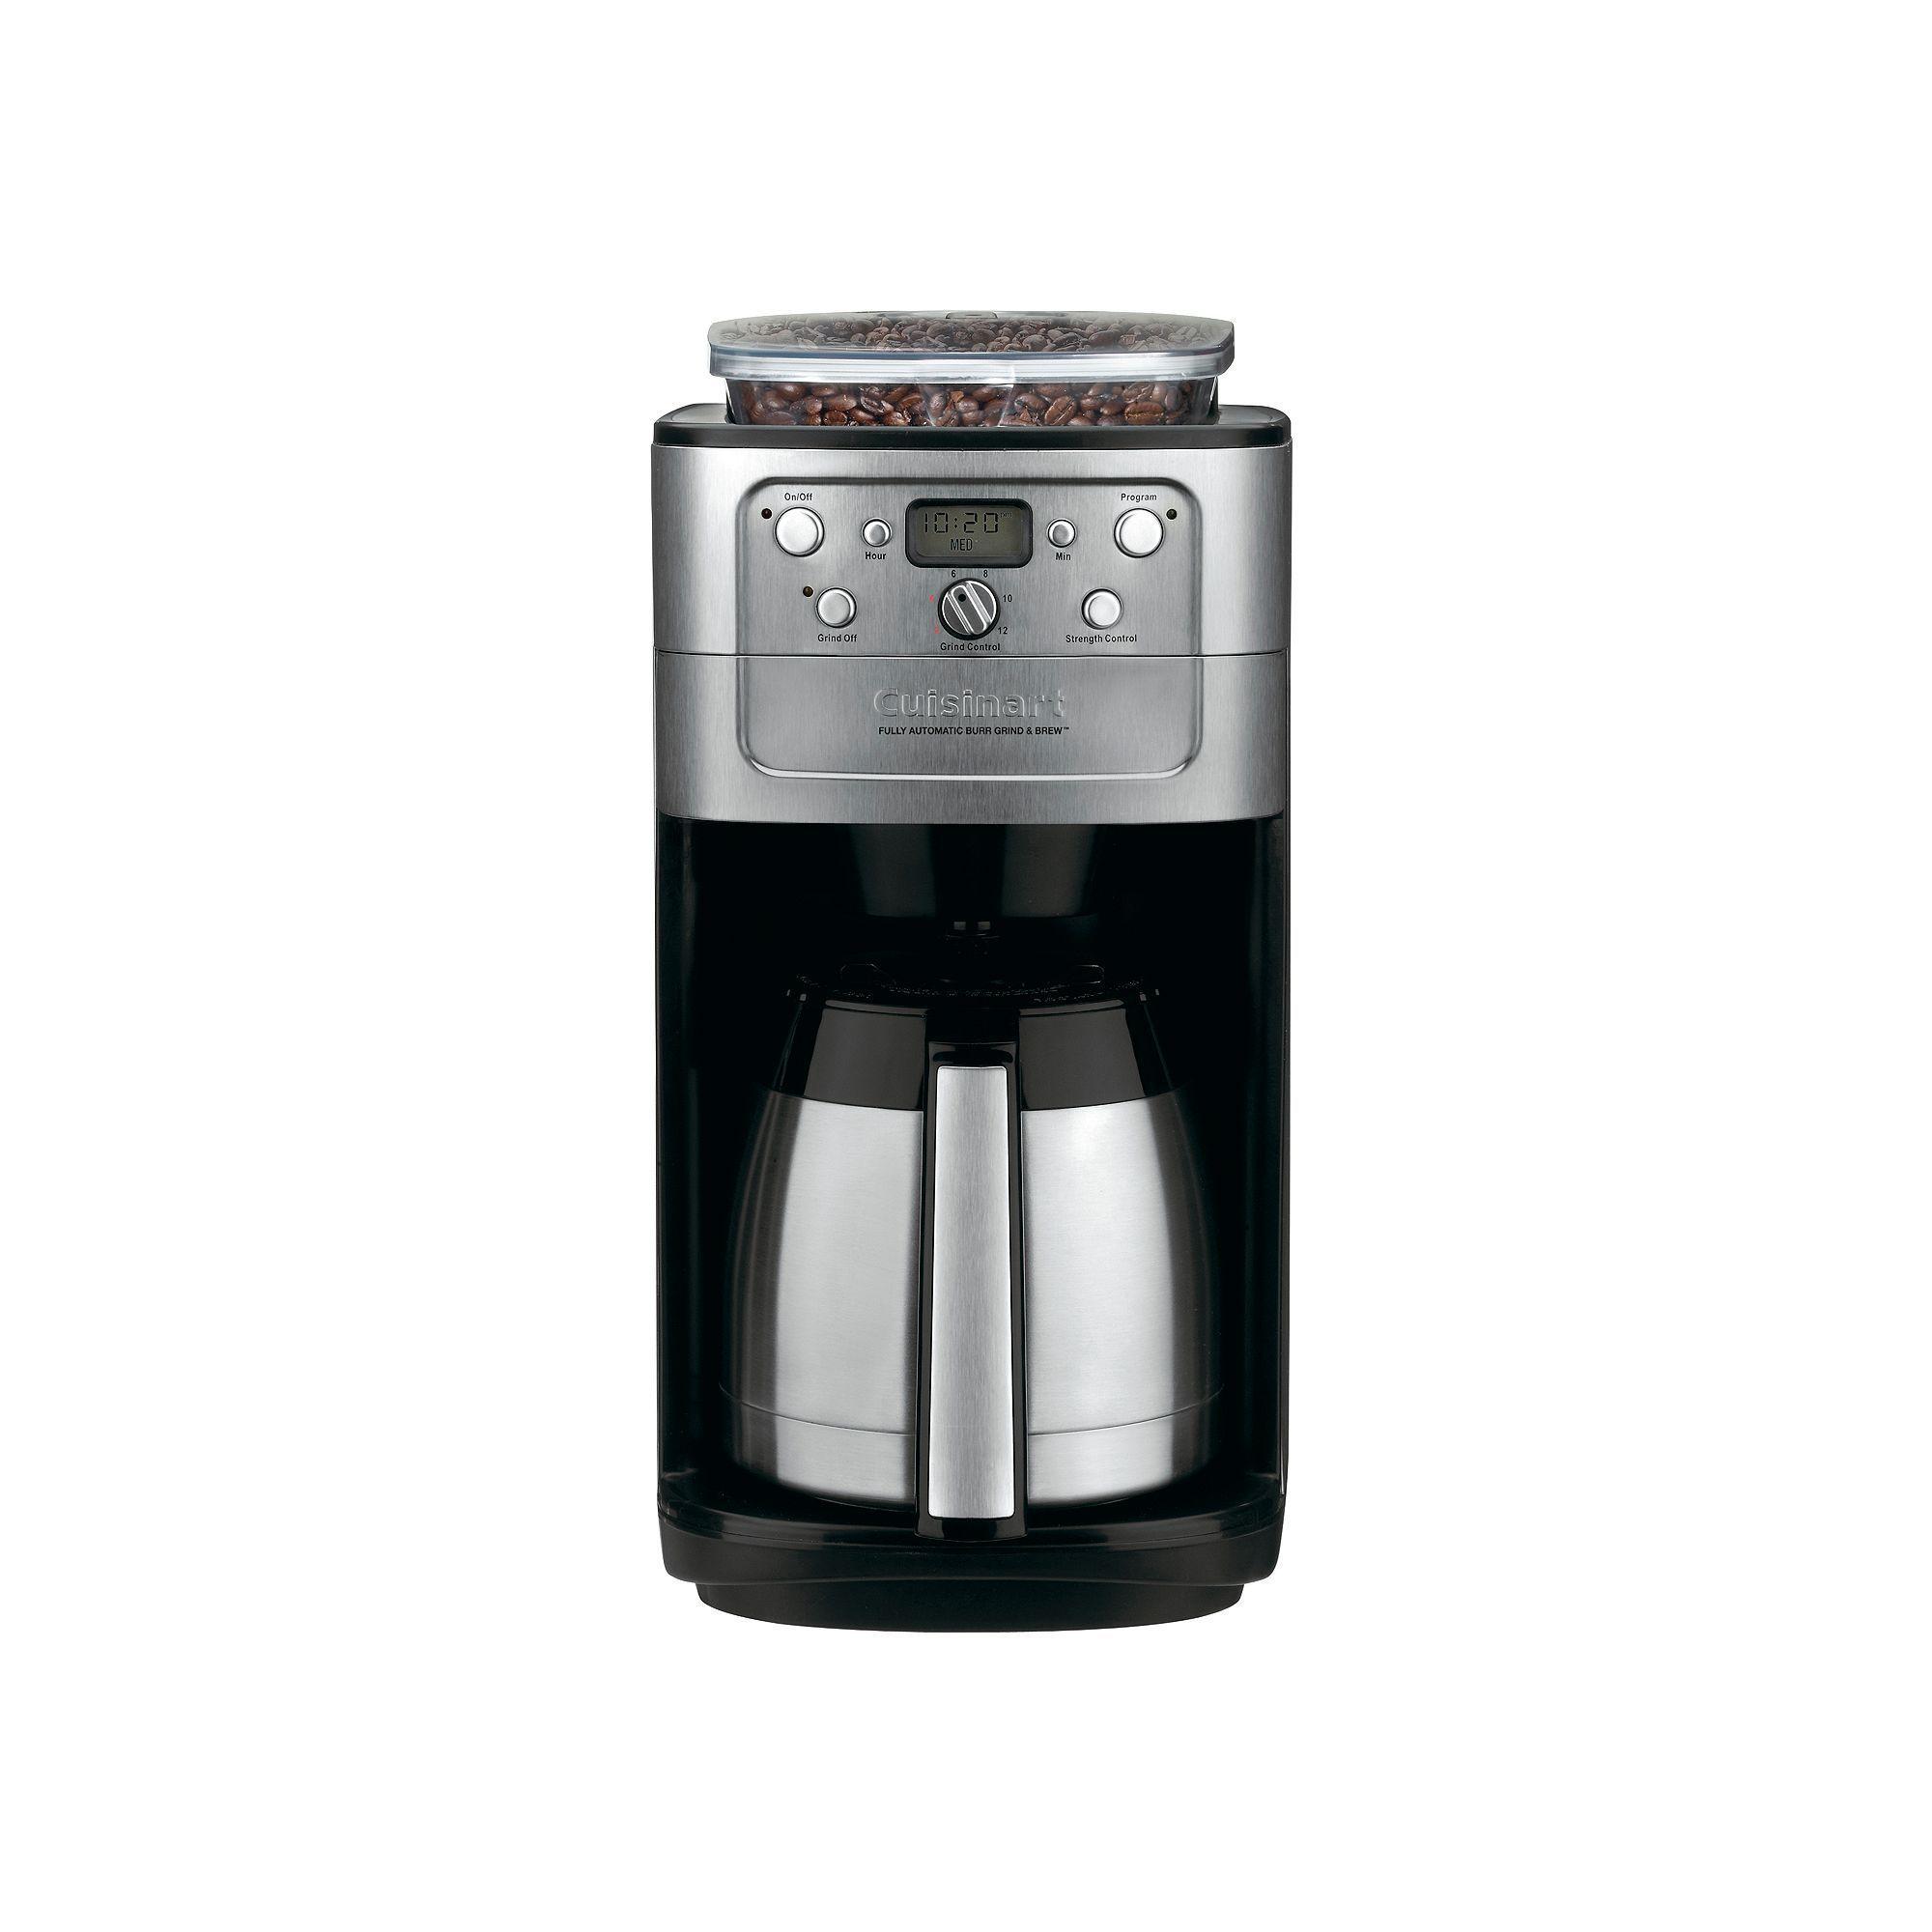 Cuisinart Grind N Brew 12 Cup Thermal Coffee Maker